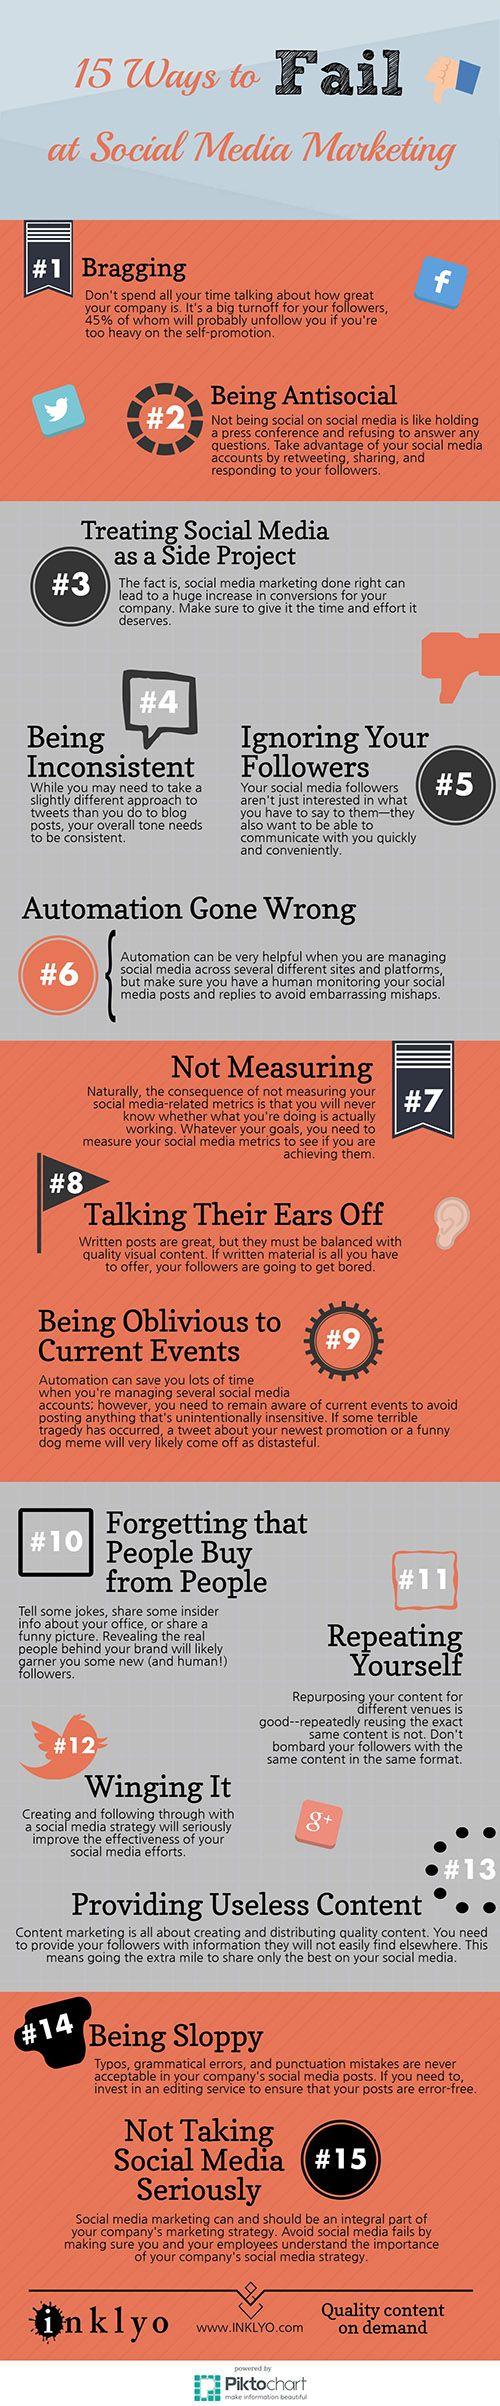 15 Ways to Fail at Social Media Marketing (Infographic)